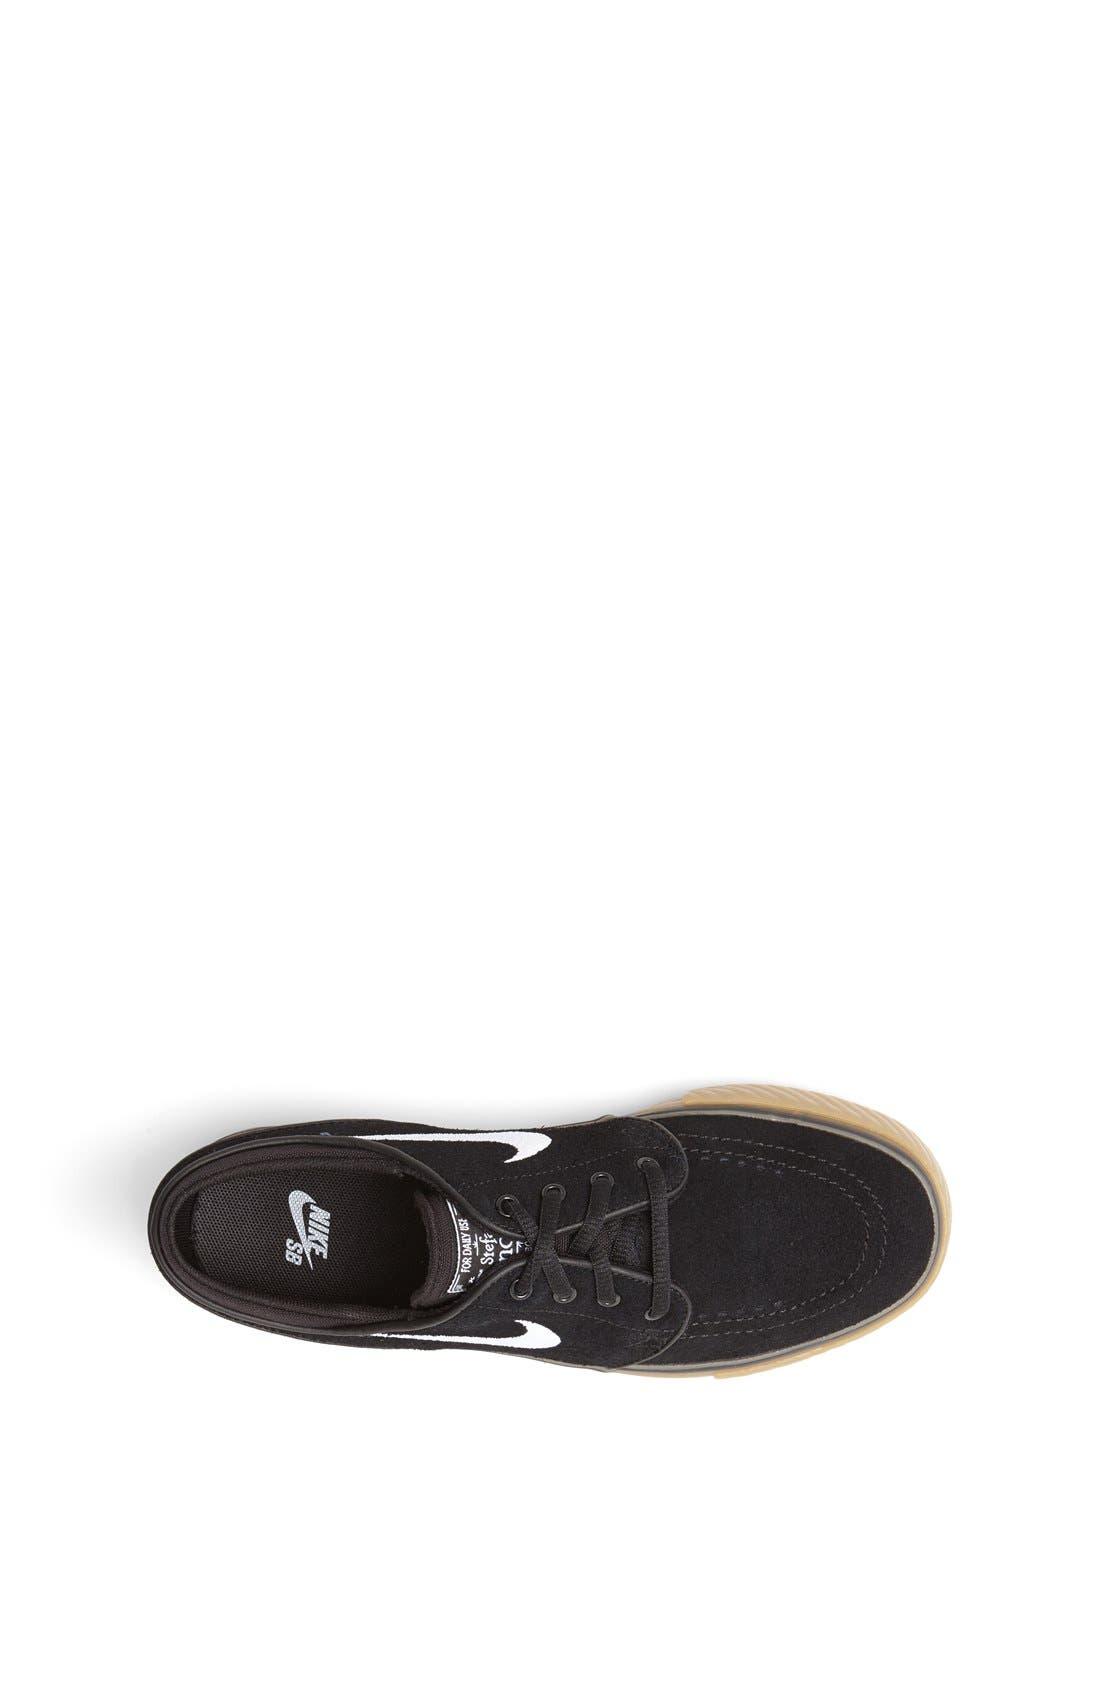 'Stefan Janoski' Sneaker,                             Alternate thumbnail 19, color,